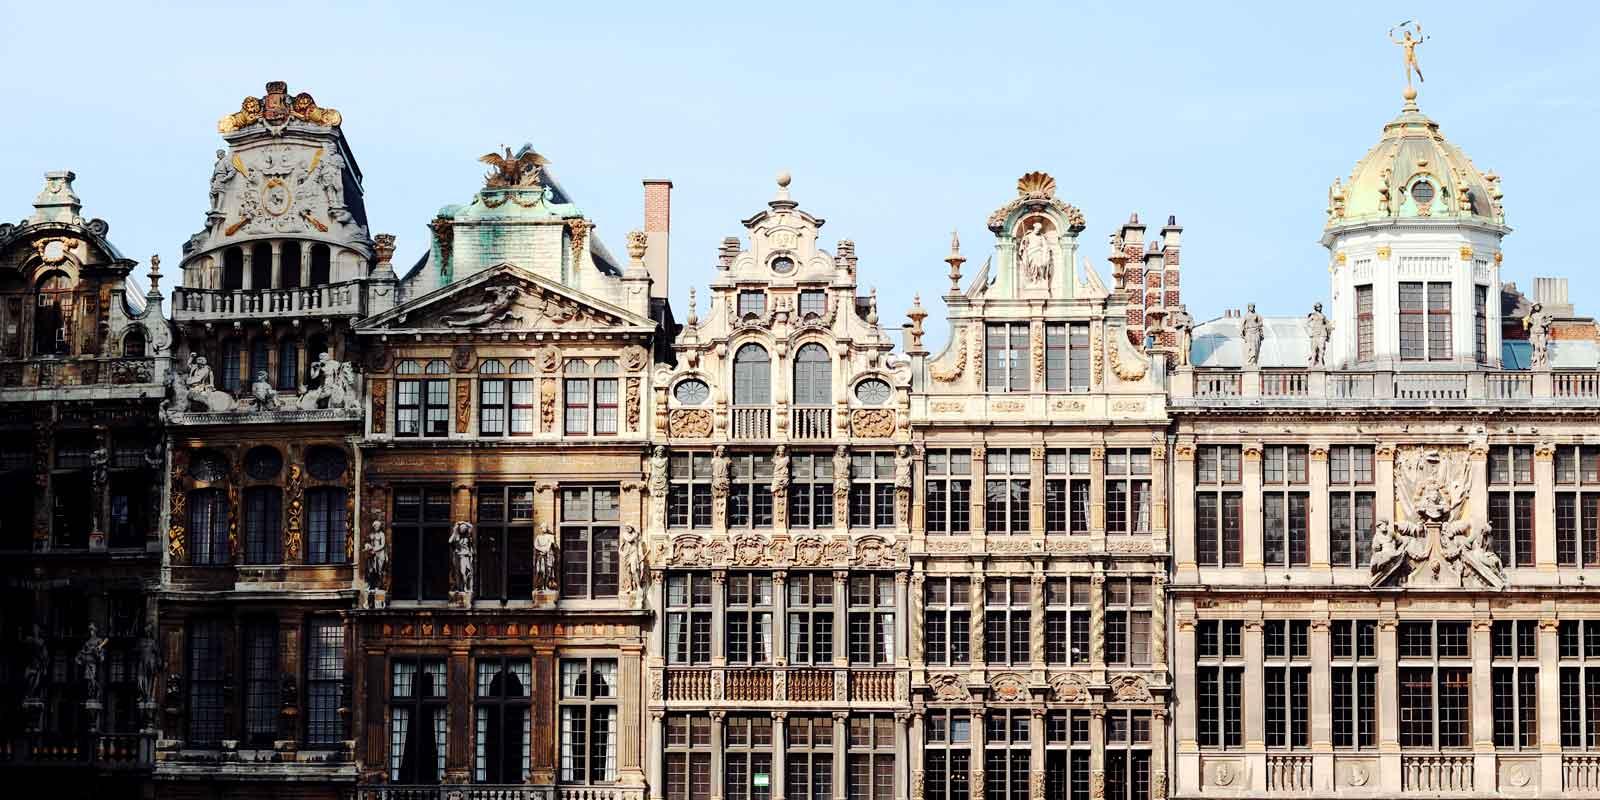 Landscape view of ornate buildings in Brussels, Belgium.